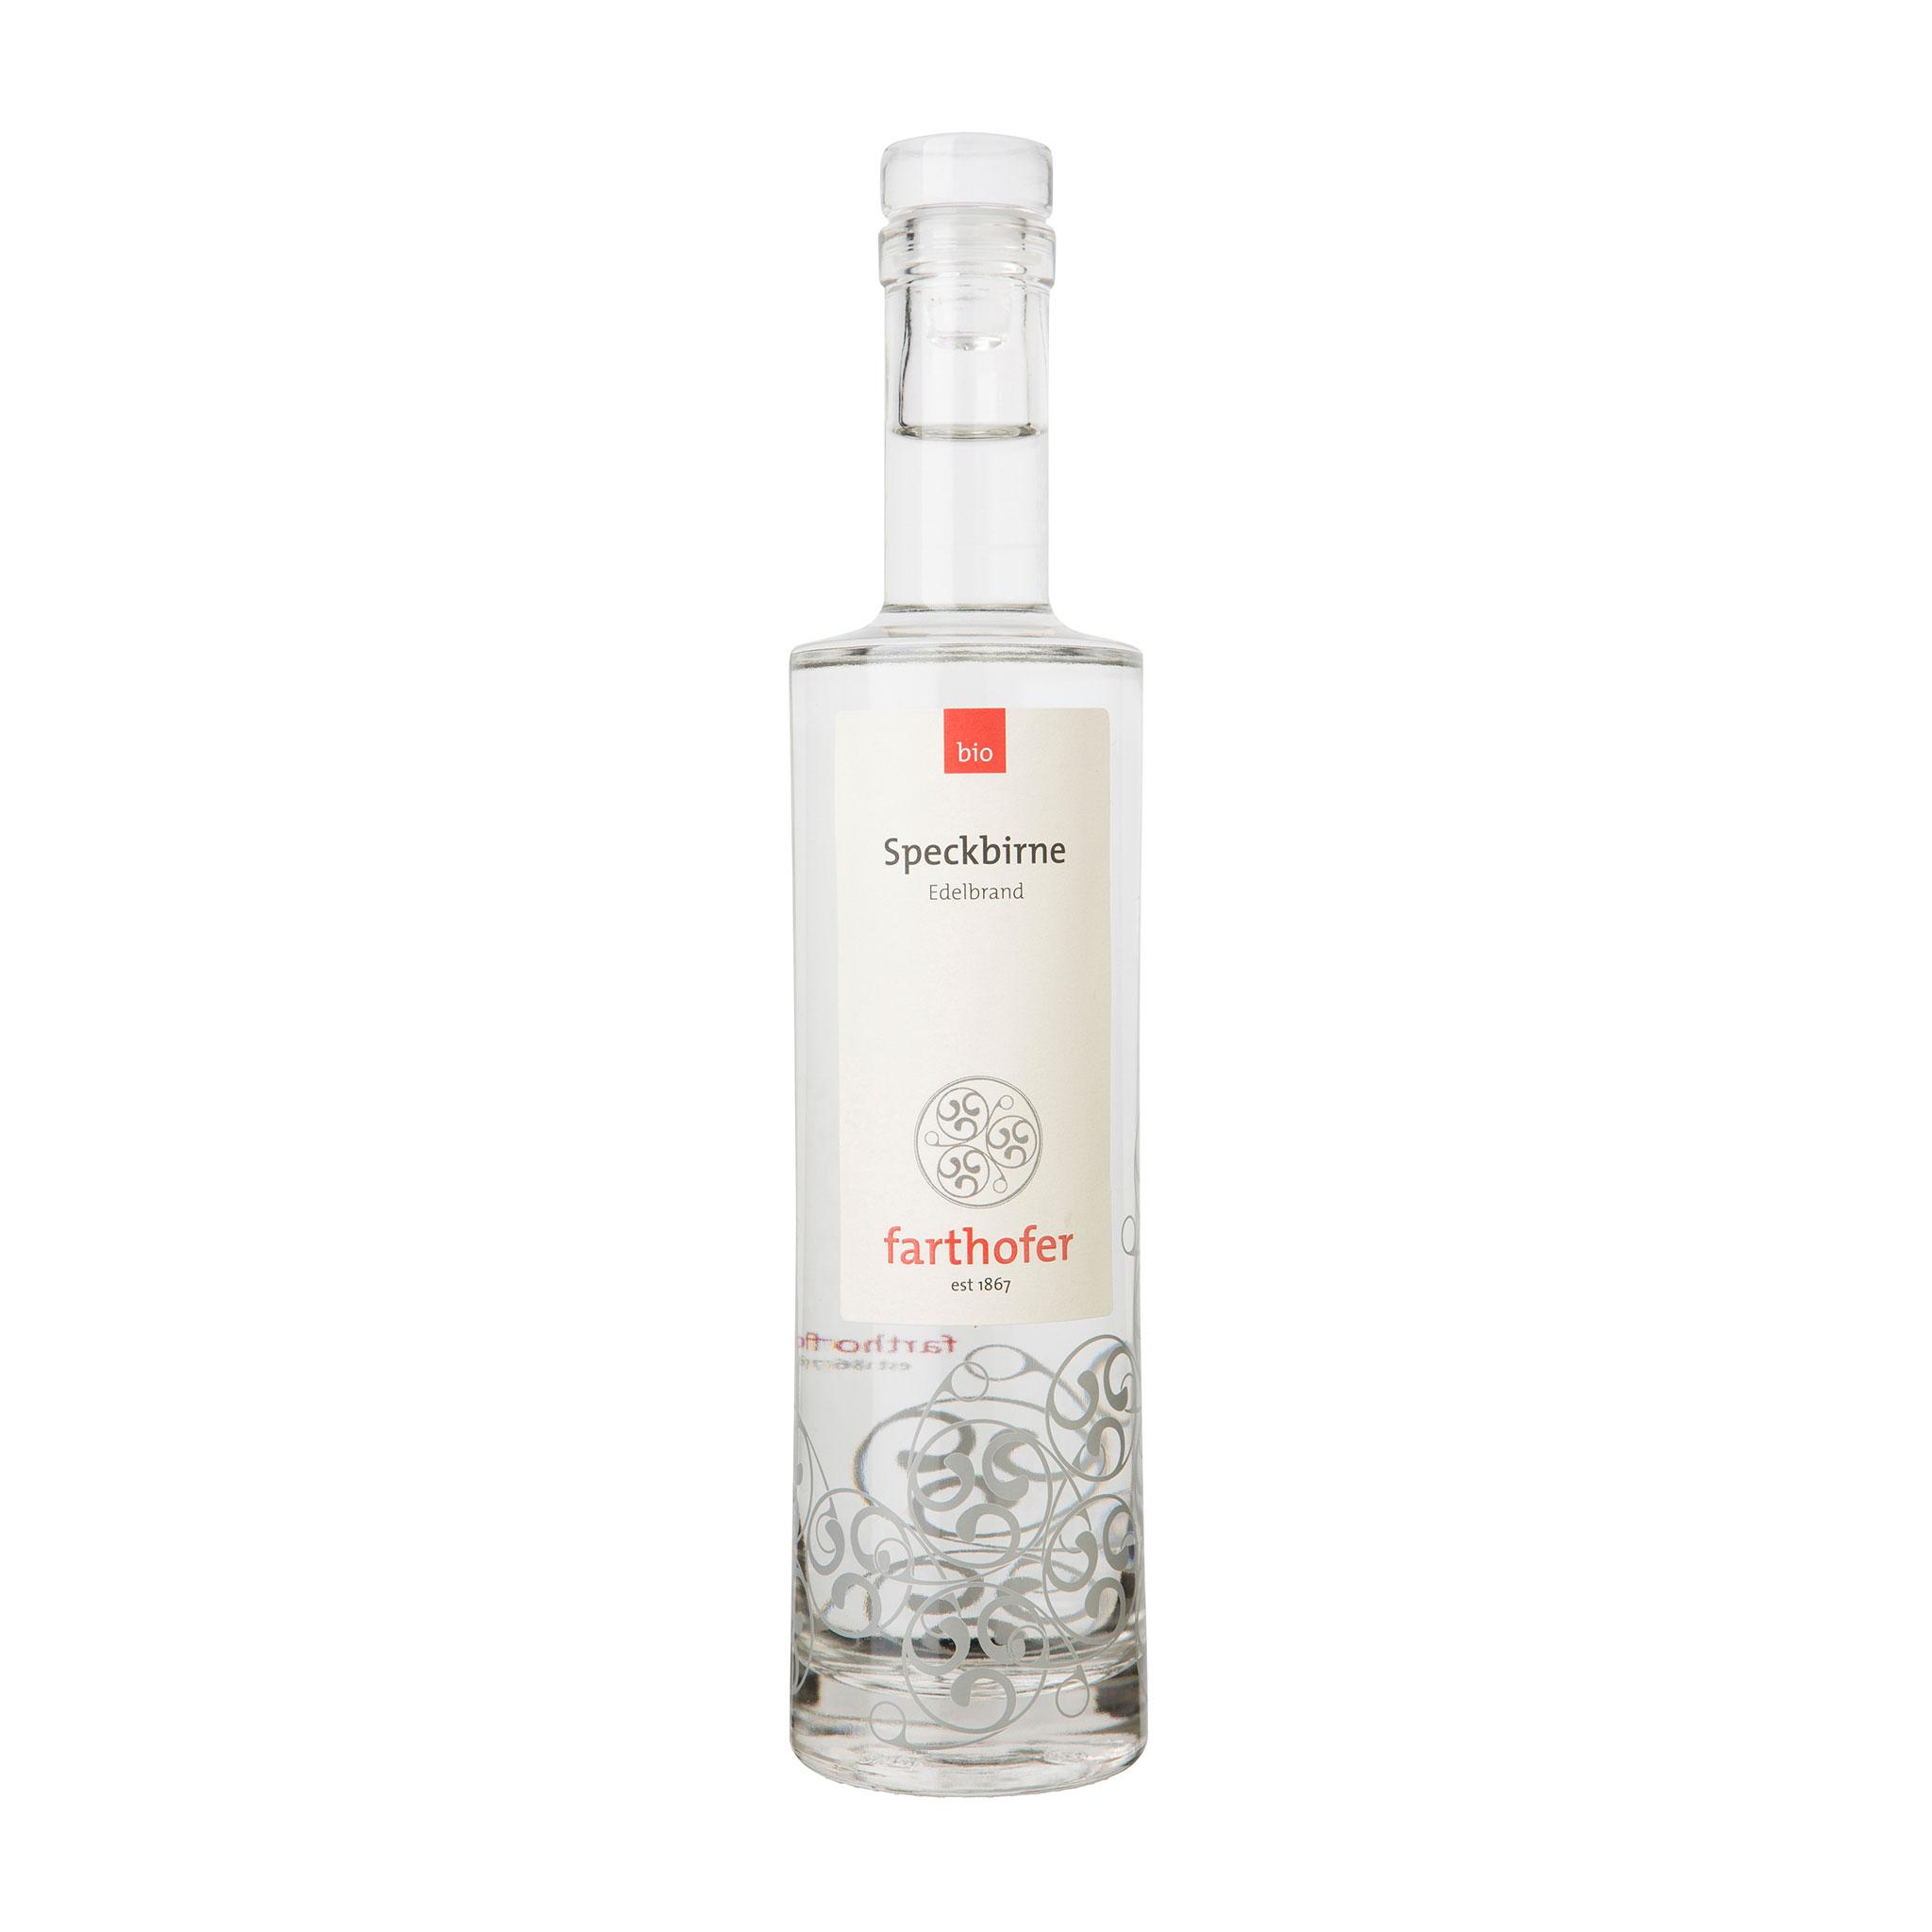 Speckbirne (700 ml)